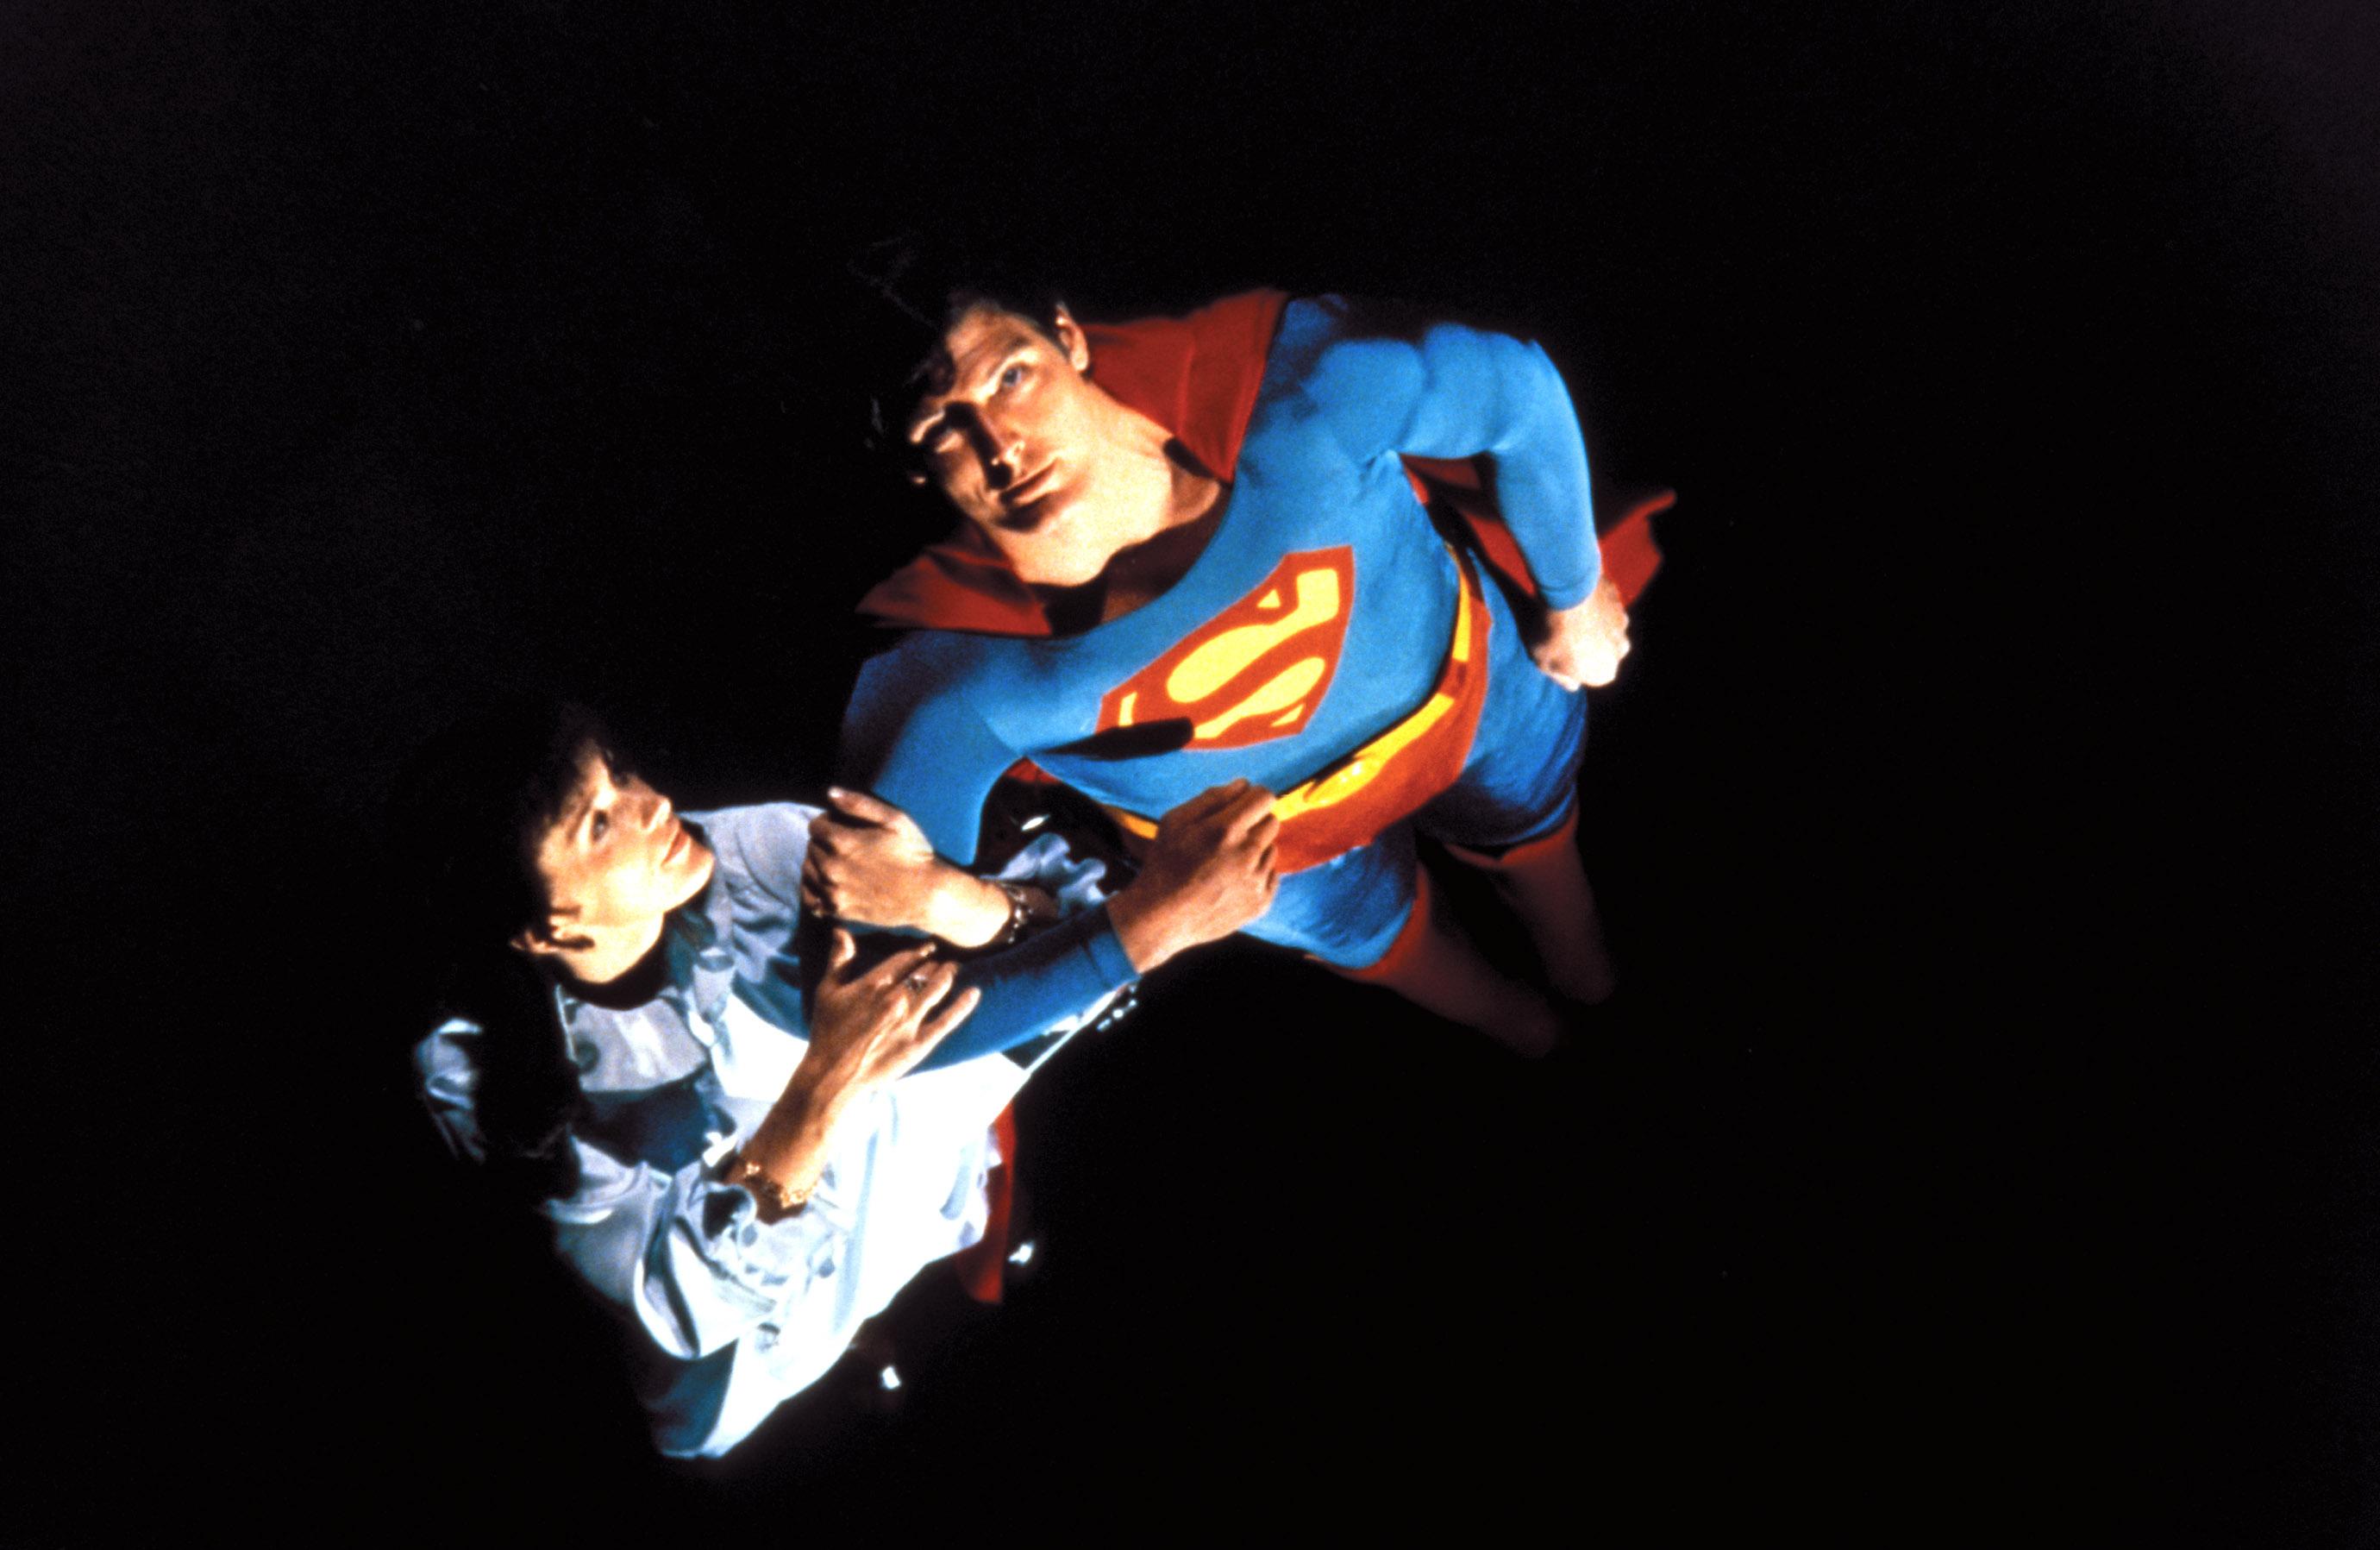 superman-margot-kidder-christopher-reeve